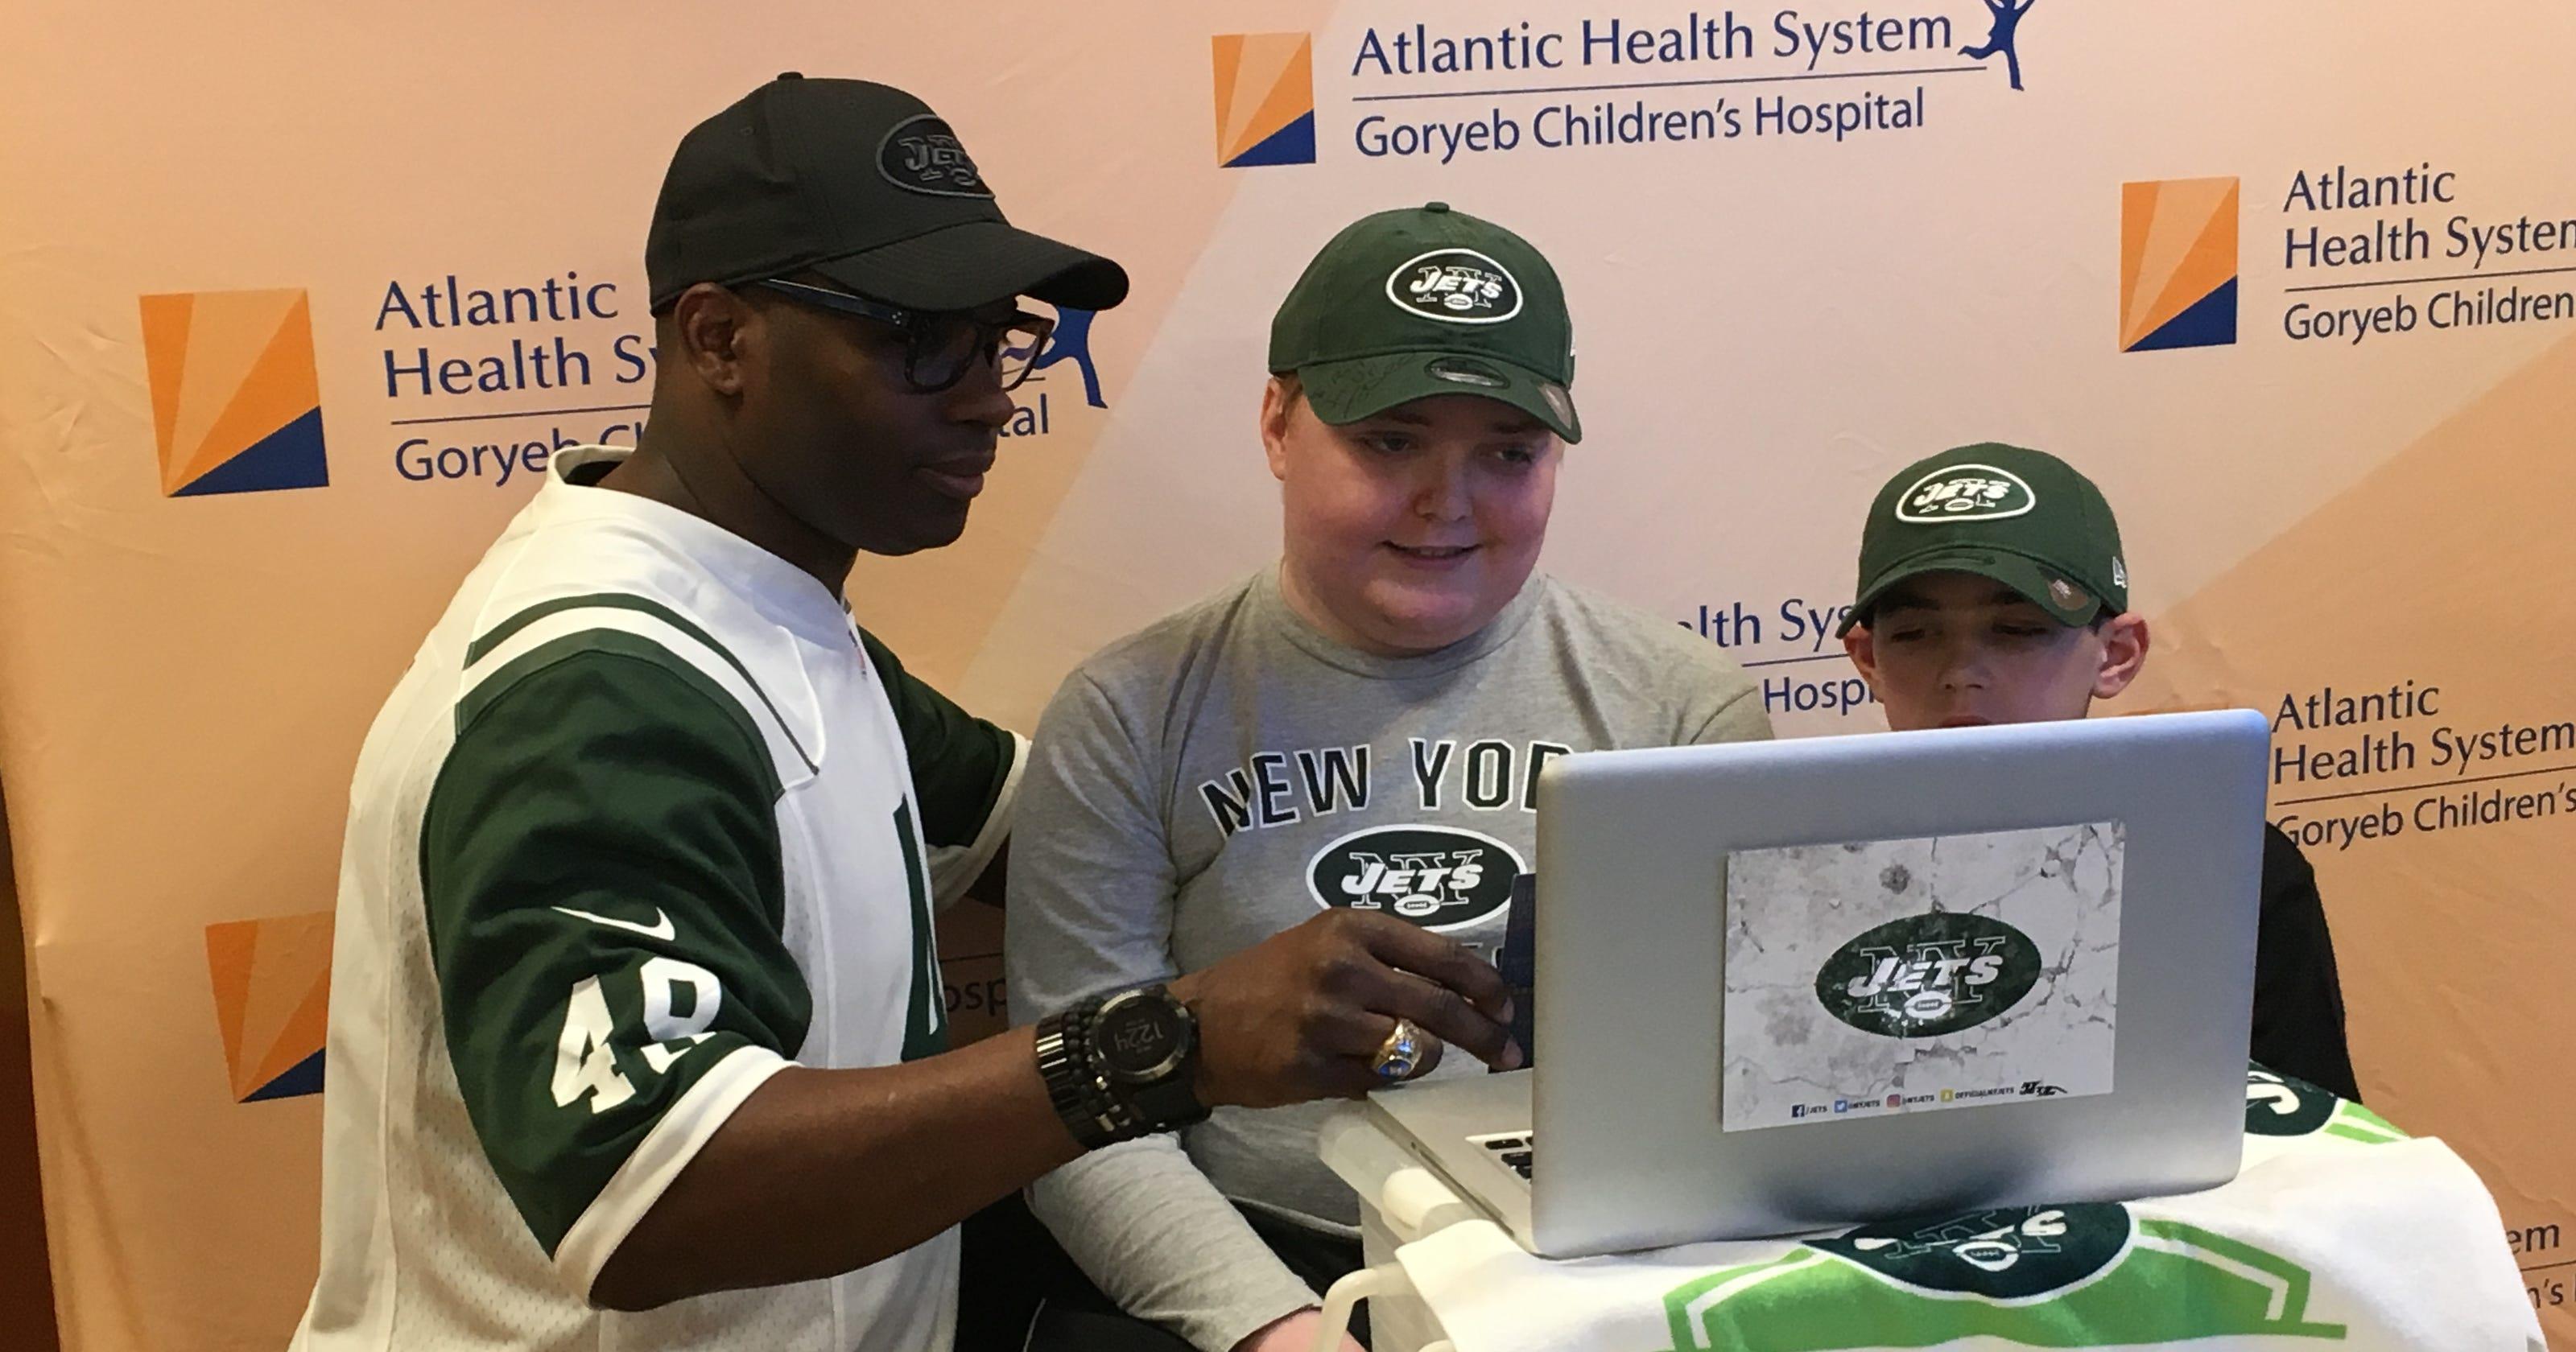 Jets Bring Nfl Draft Day To Goryeb Children S Hospital